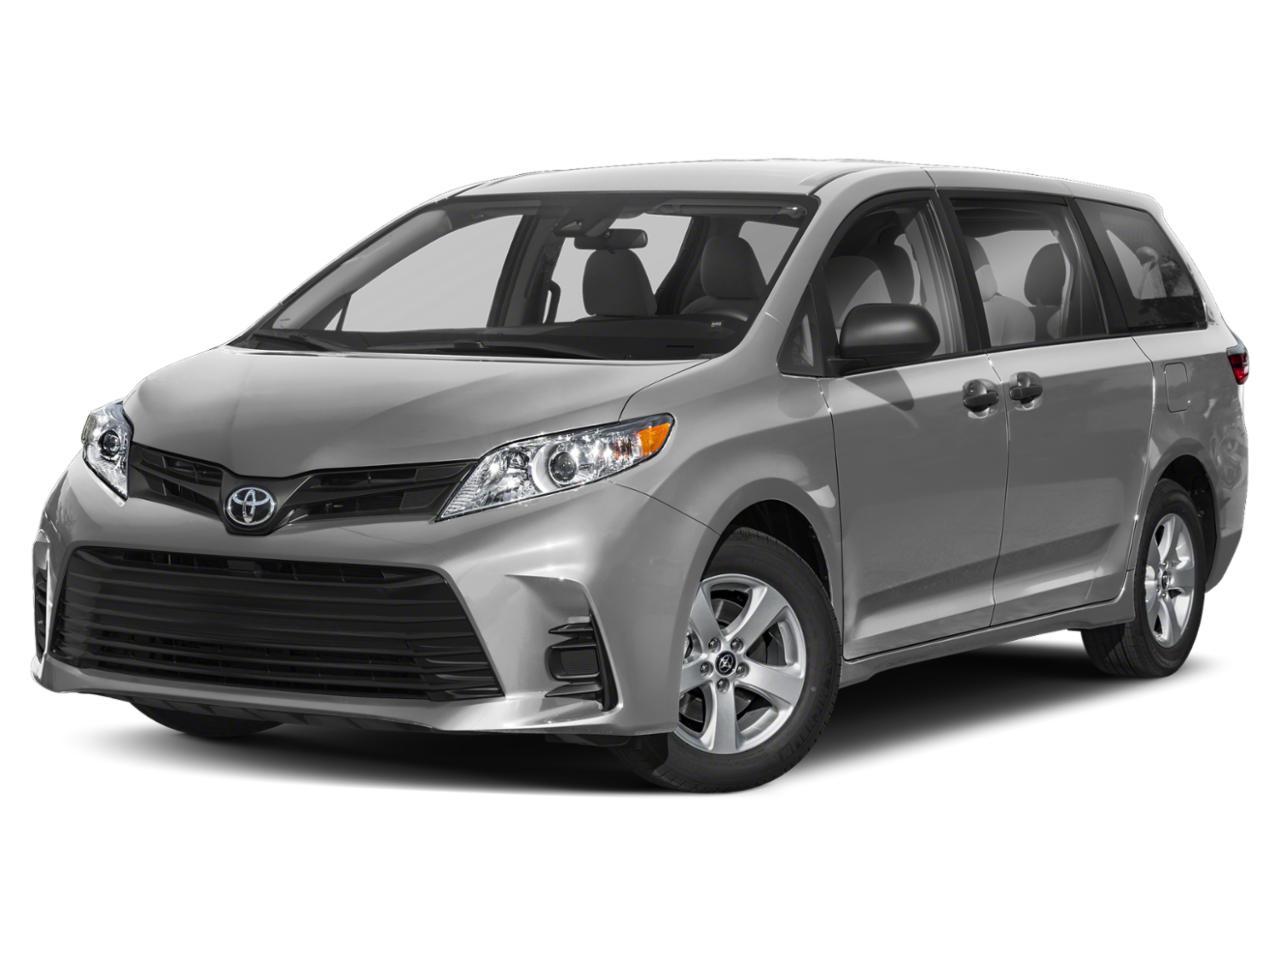 2018 Toyota Sienna Vehicle Photo in MADISON, WI 53713-3220